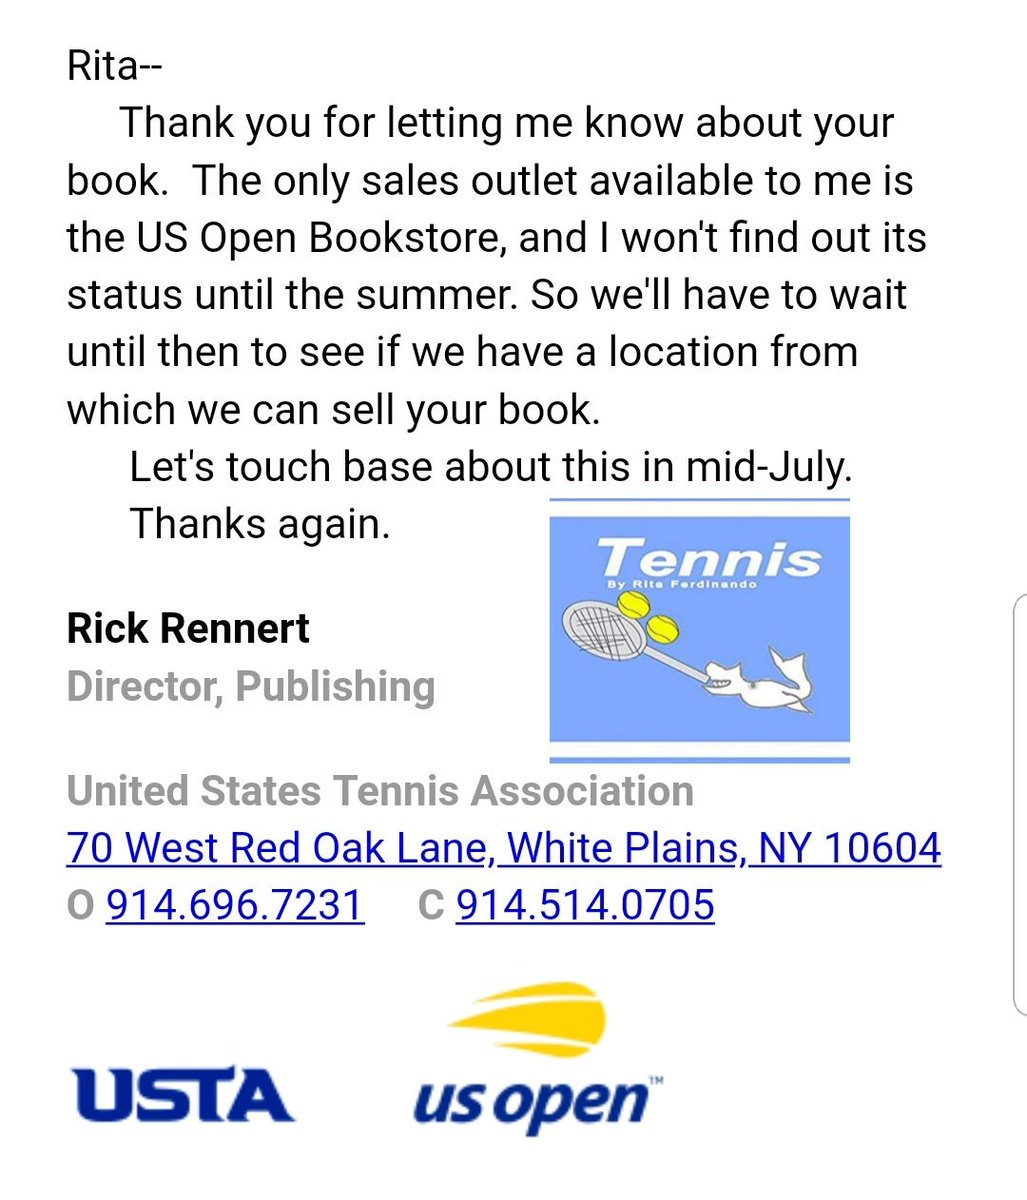 test Twitter Media - This would be the best Valentine's day gift ever! Or your Tennis Coach #WTA #ValentinesDay #UsopenTennis #wimbledon #rolandgarros #Frenchopen #Tennis #australianopen #ATP #Tennisnews #Amazon #amazonuk #britsweek #Childrensbooks #Bookstores #Merchandising #Tennisproshops https://t.co/m8xCIi3Xr0